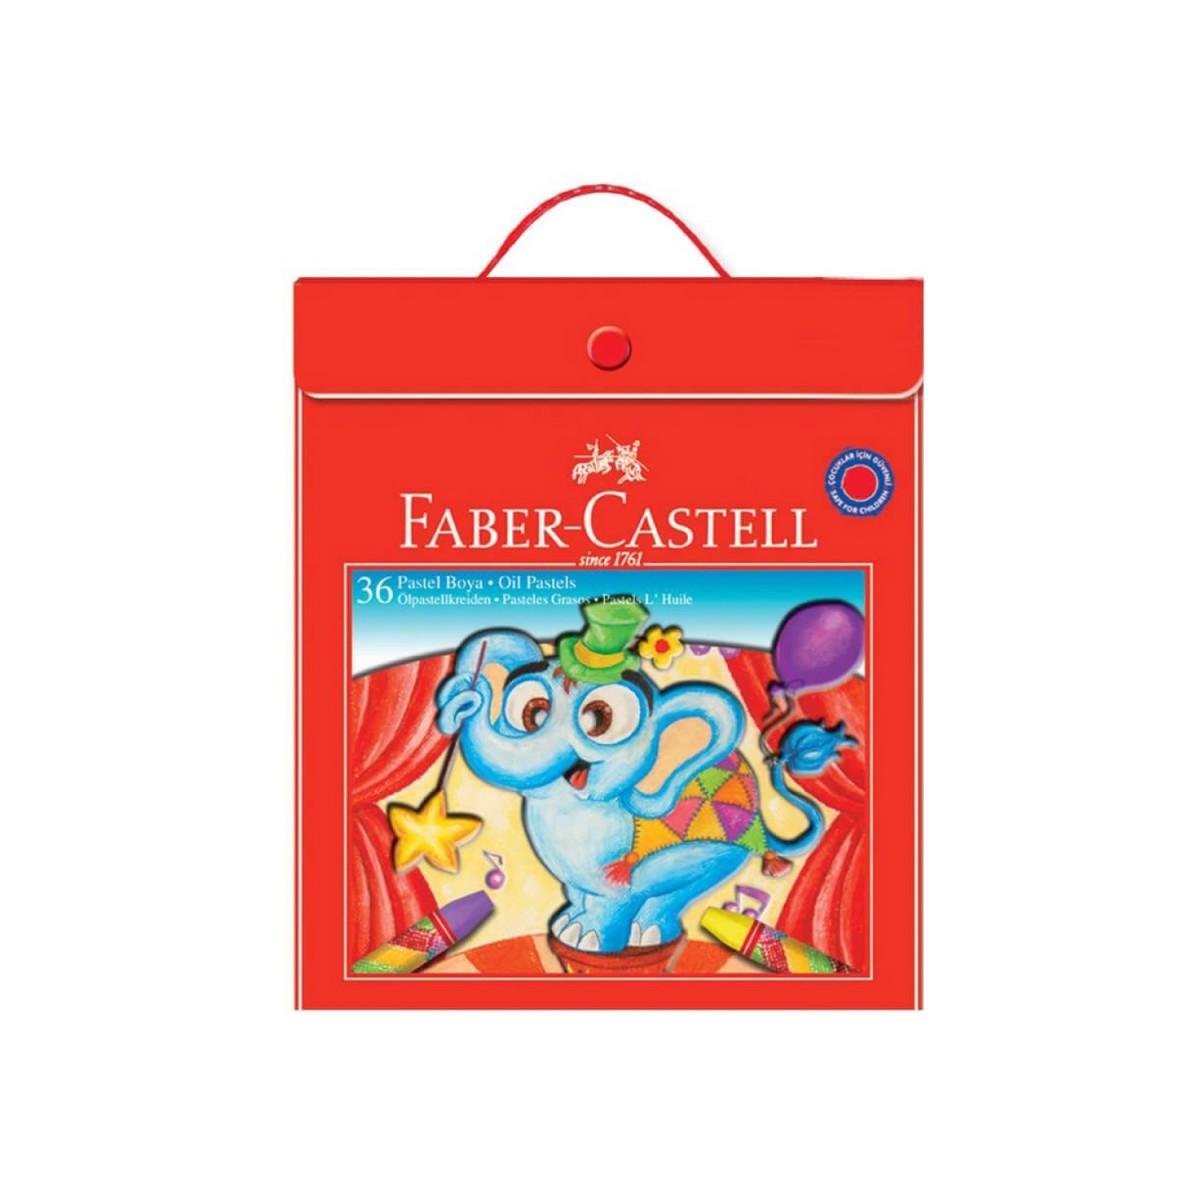 Faber Castell 36 Renk Plastik Çantalı Pastel Boya